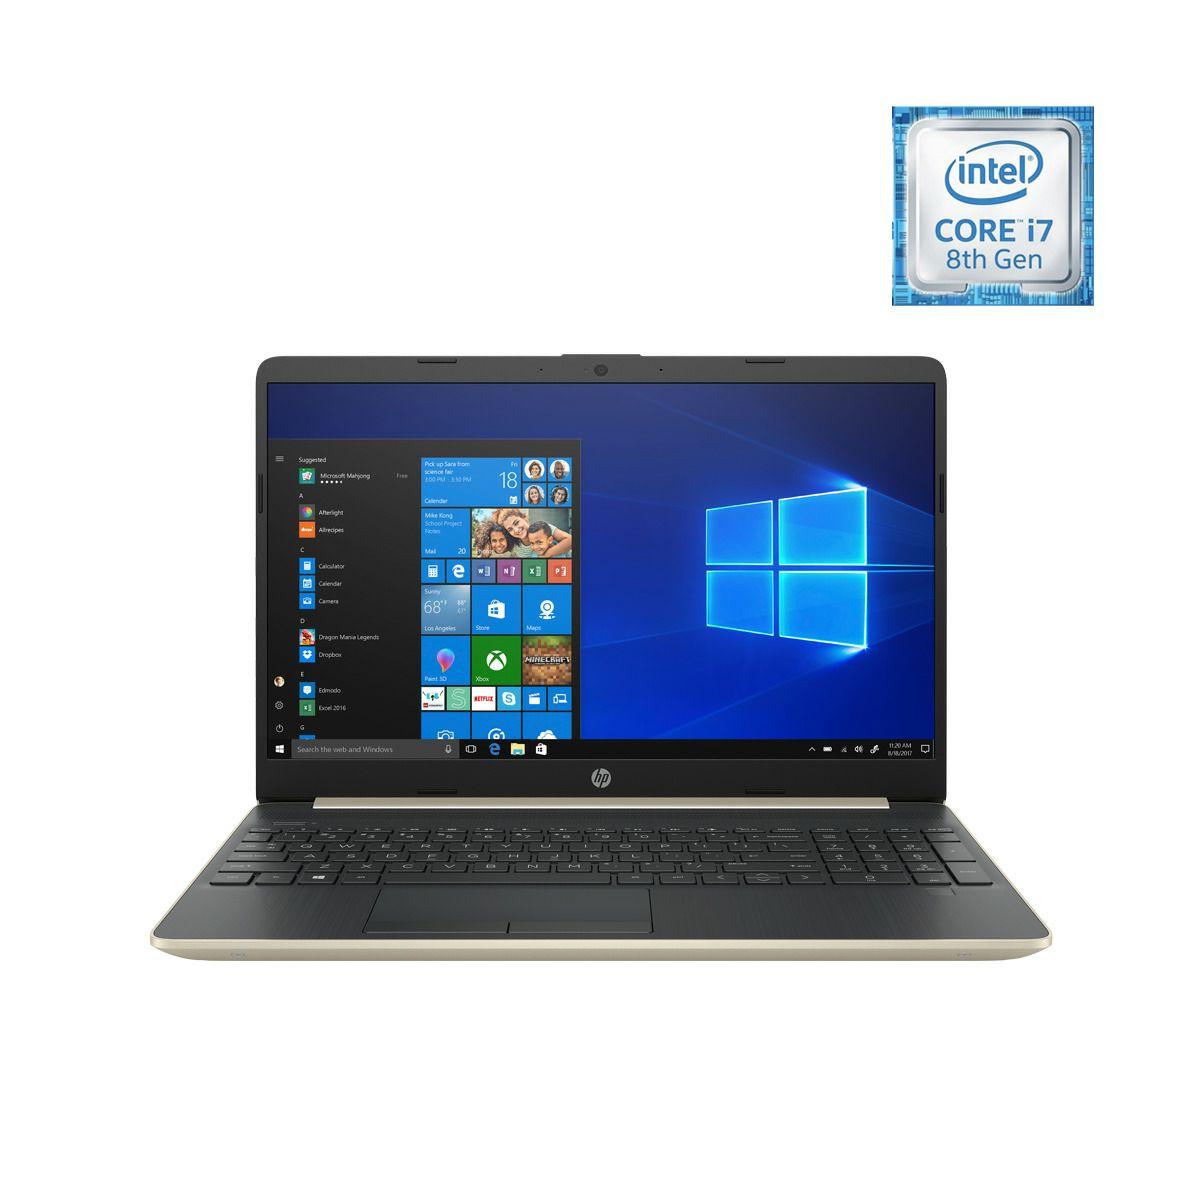 Portátil HP 15-dw0000ns, i7, 12 GB RAM, 1 TB HDD + 256 GB SSD, MX130 2 GB